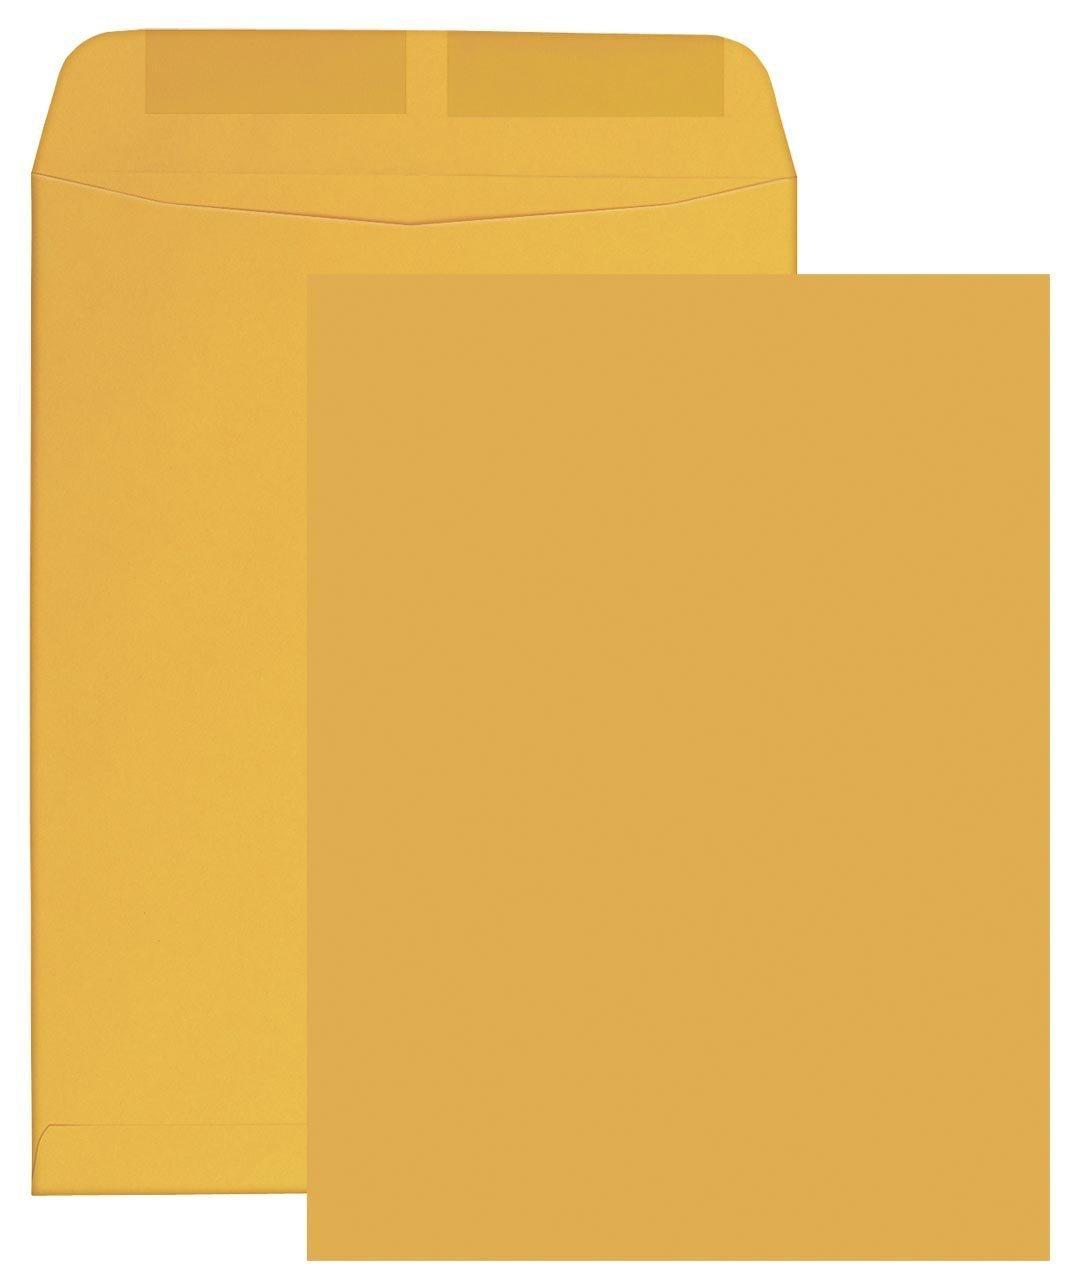 6'' x 9'' Catalog Envelope (Open End) Brown Kraft 500 Count- MCT6950